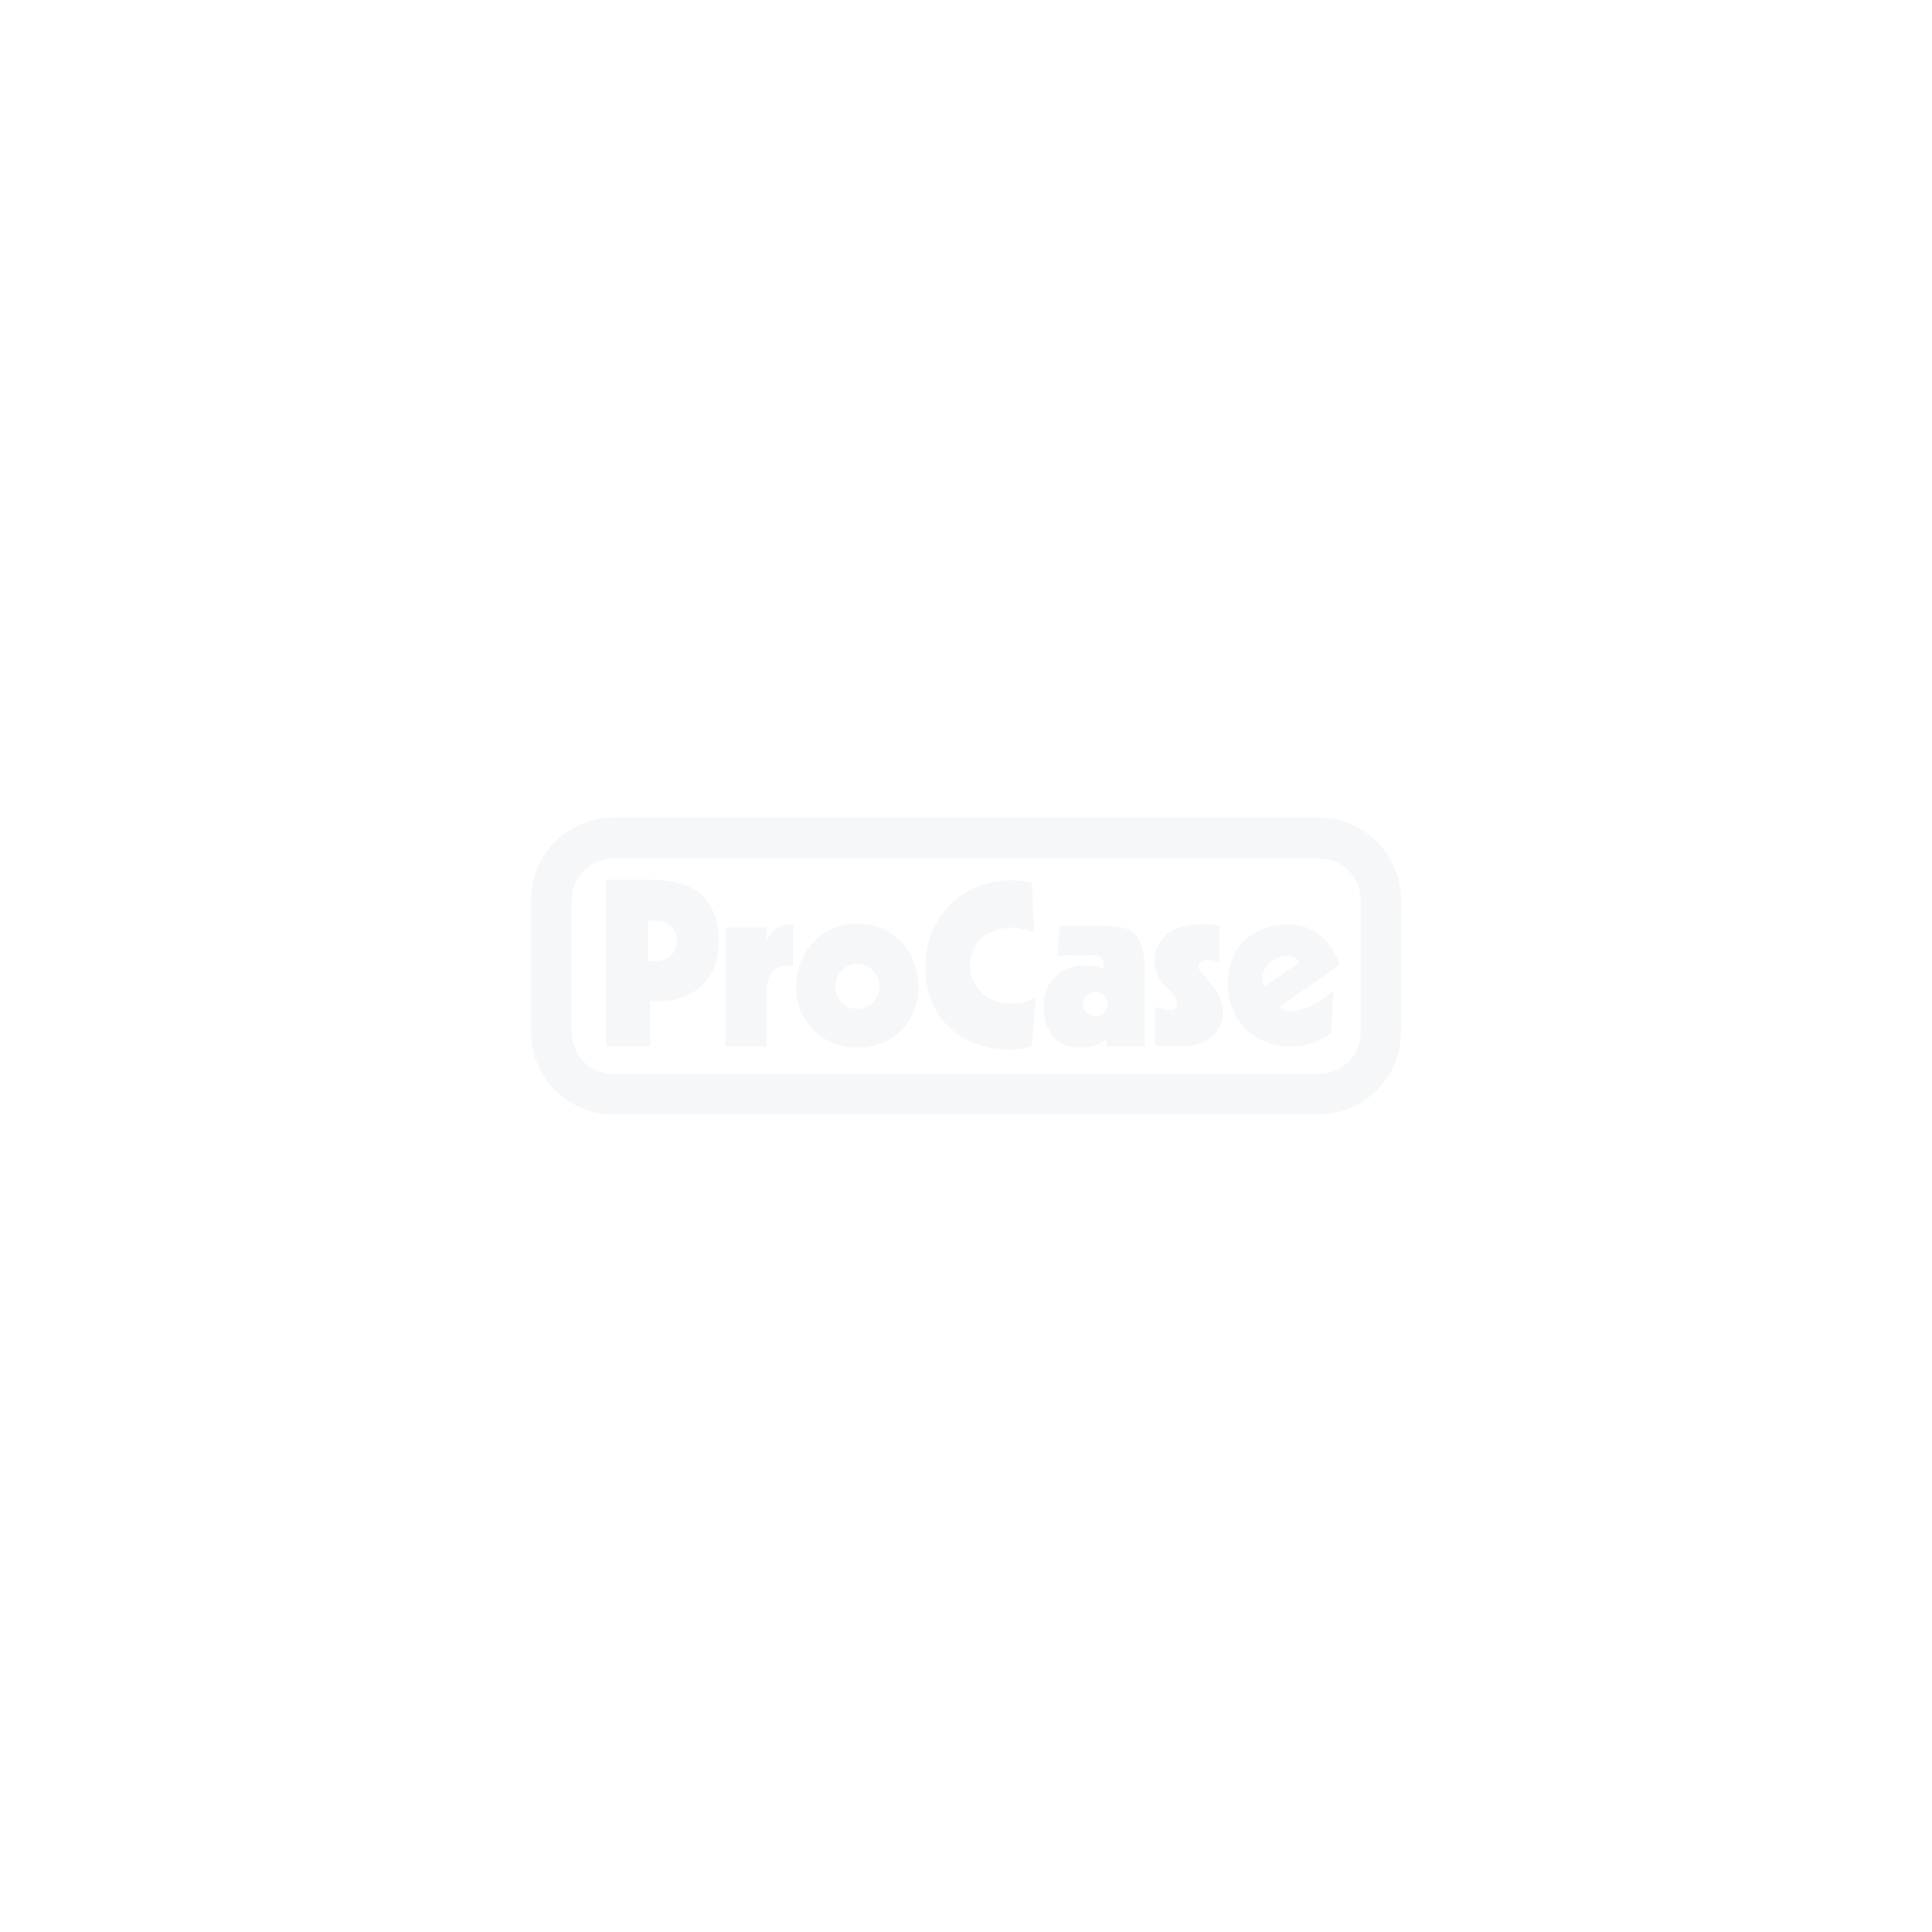 Flightcase Vari-Lite VL1000/1100 Etagencase 2